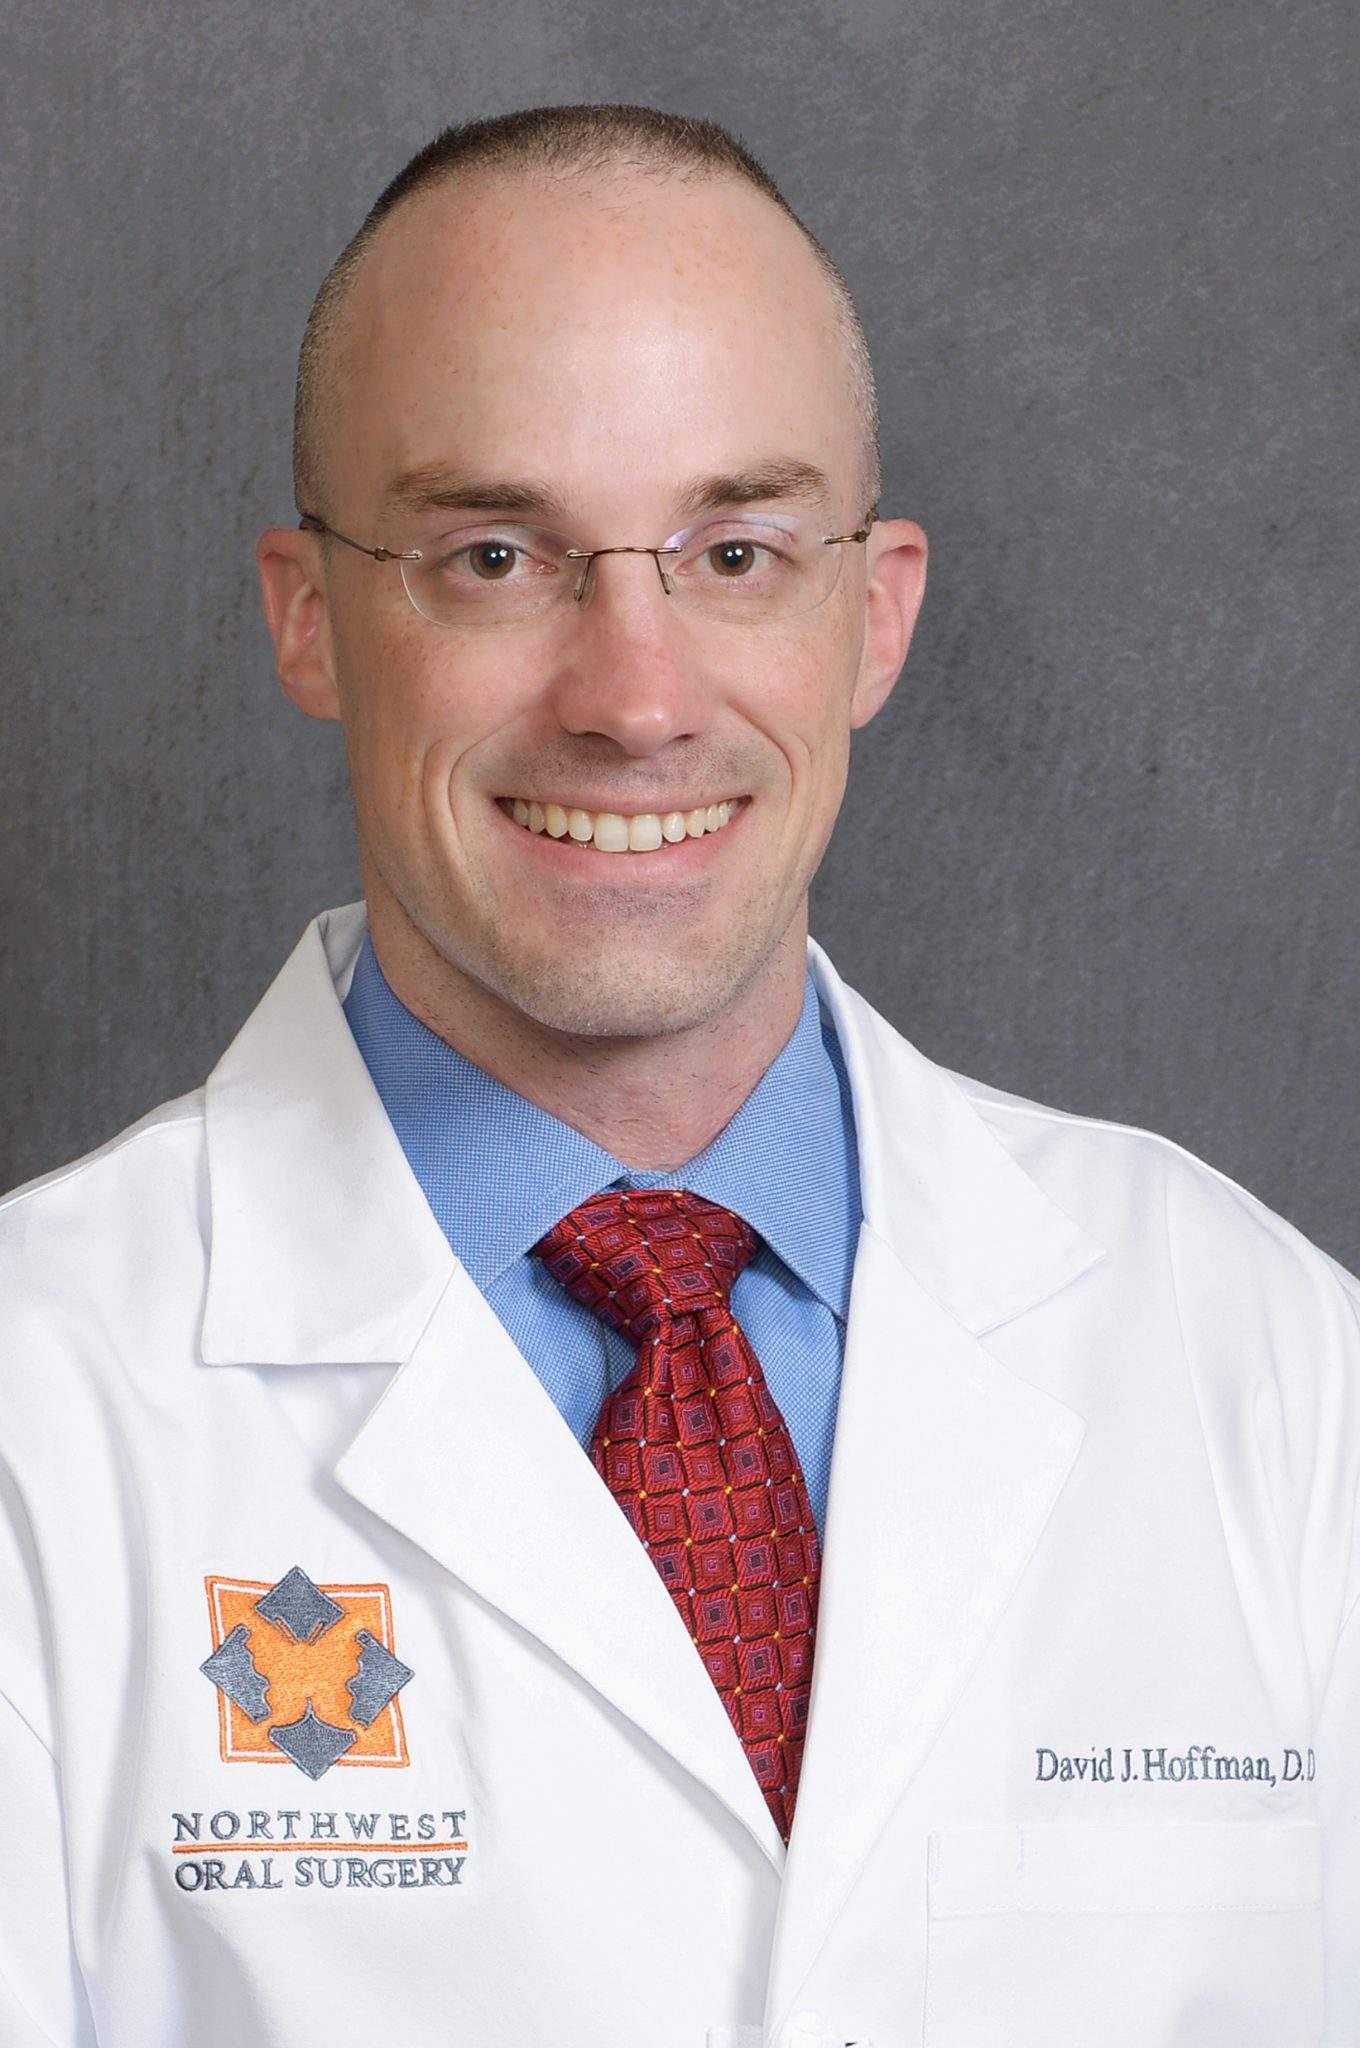 Dr. Hoffman - Northwest Oral & Maxillofacial Surgery